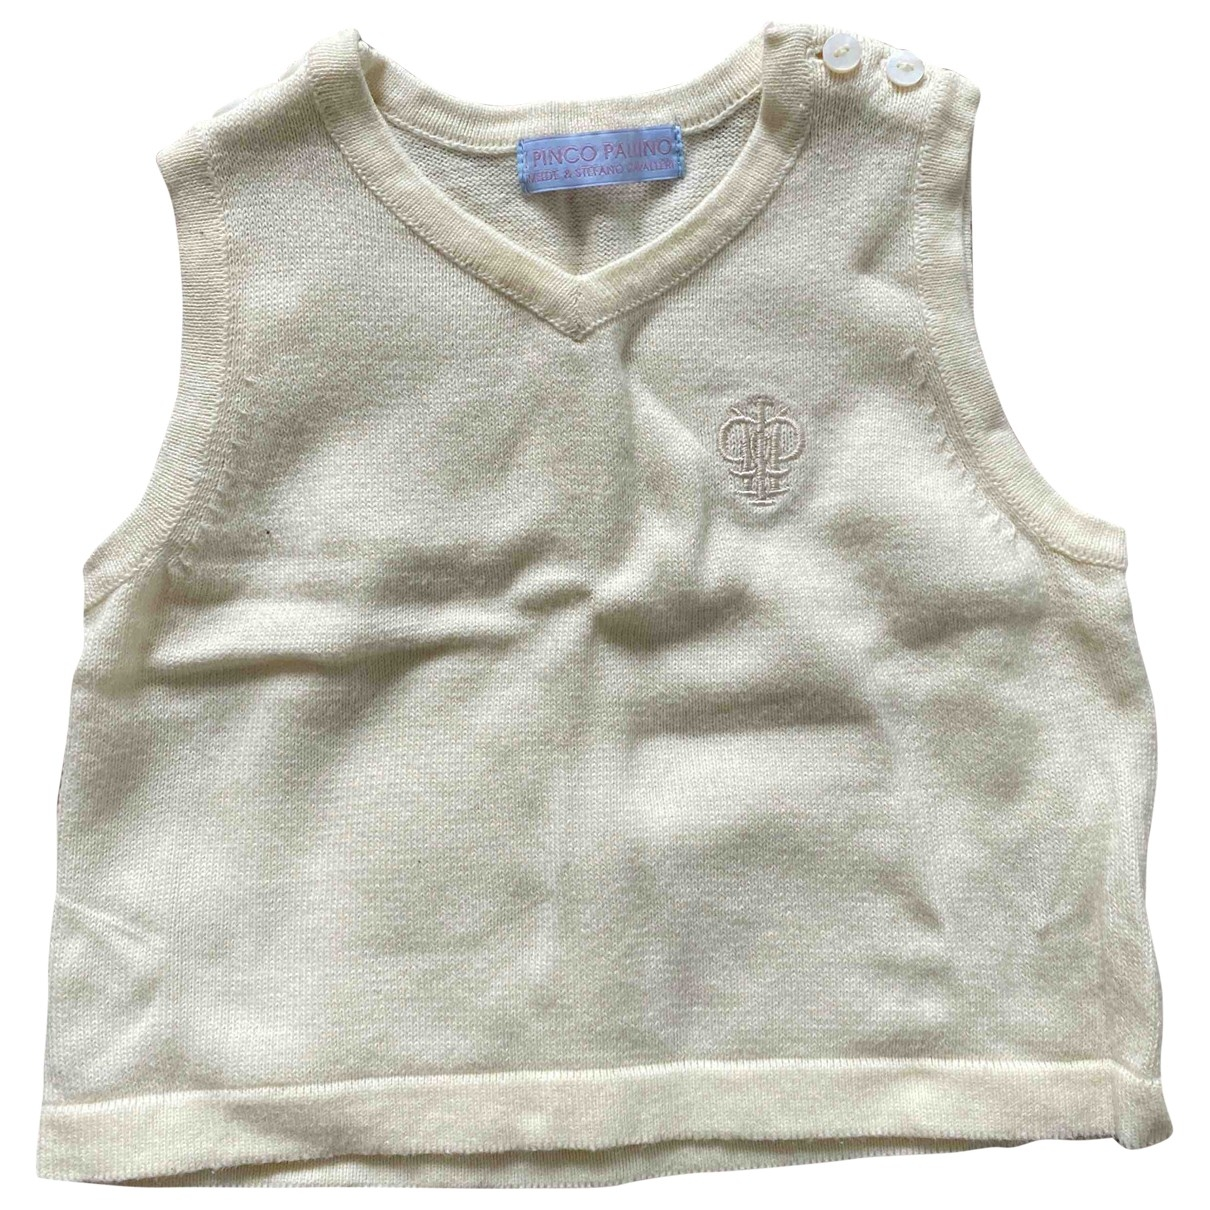 I Pinco Pallino \N Beige Cotton Knitwear for Kids 9 months - up to 71cm FR